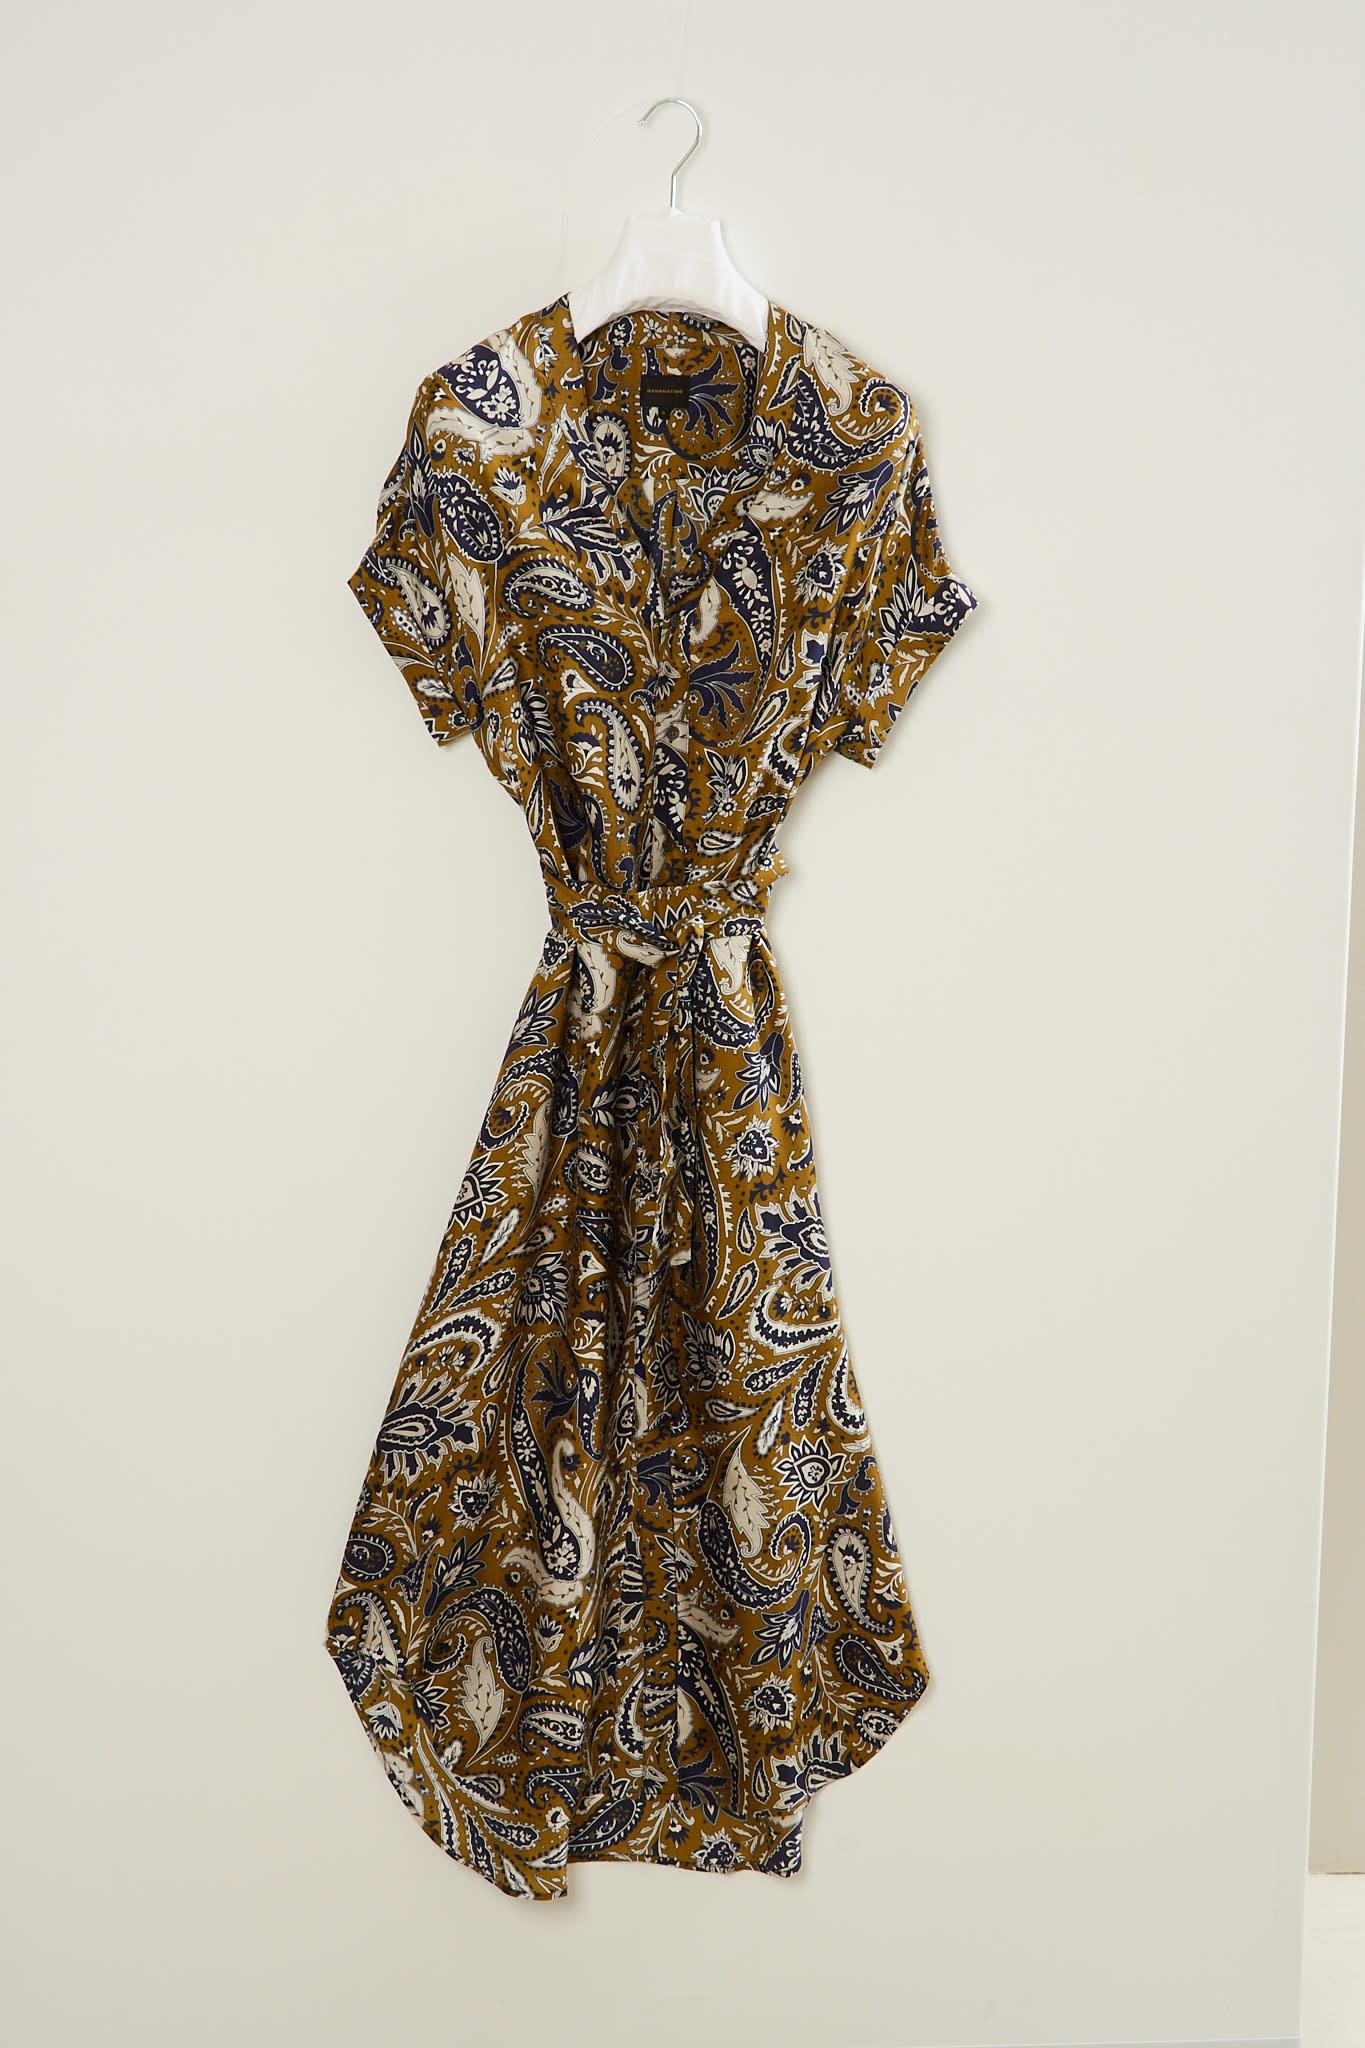 bananatime - V dress jumbo paisley shirt